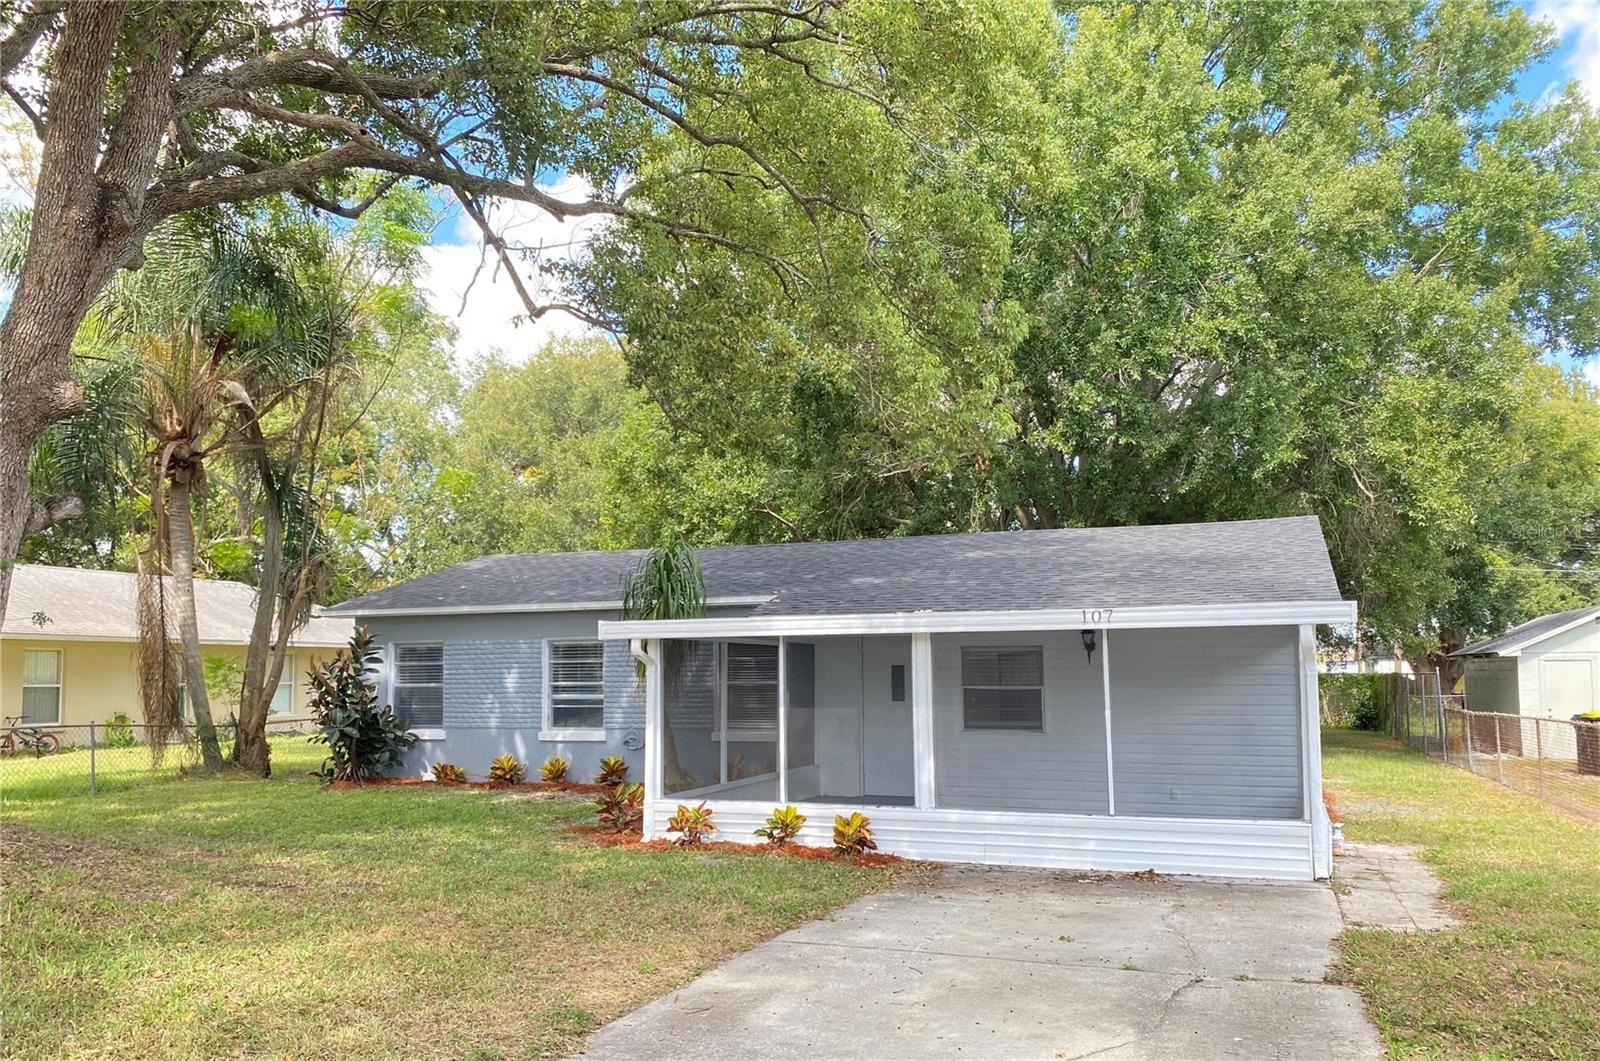 107 E POLK STREET, Auburndale, FL 33823 - MLS#: O5981285